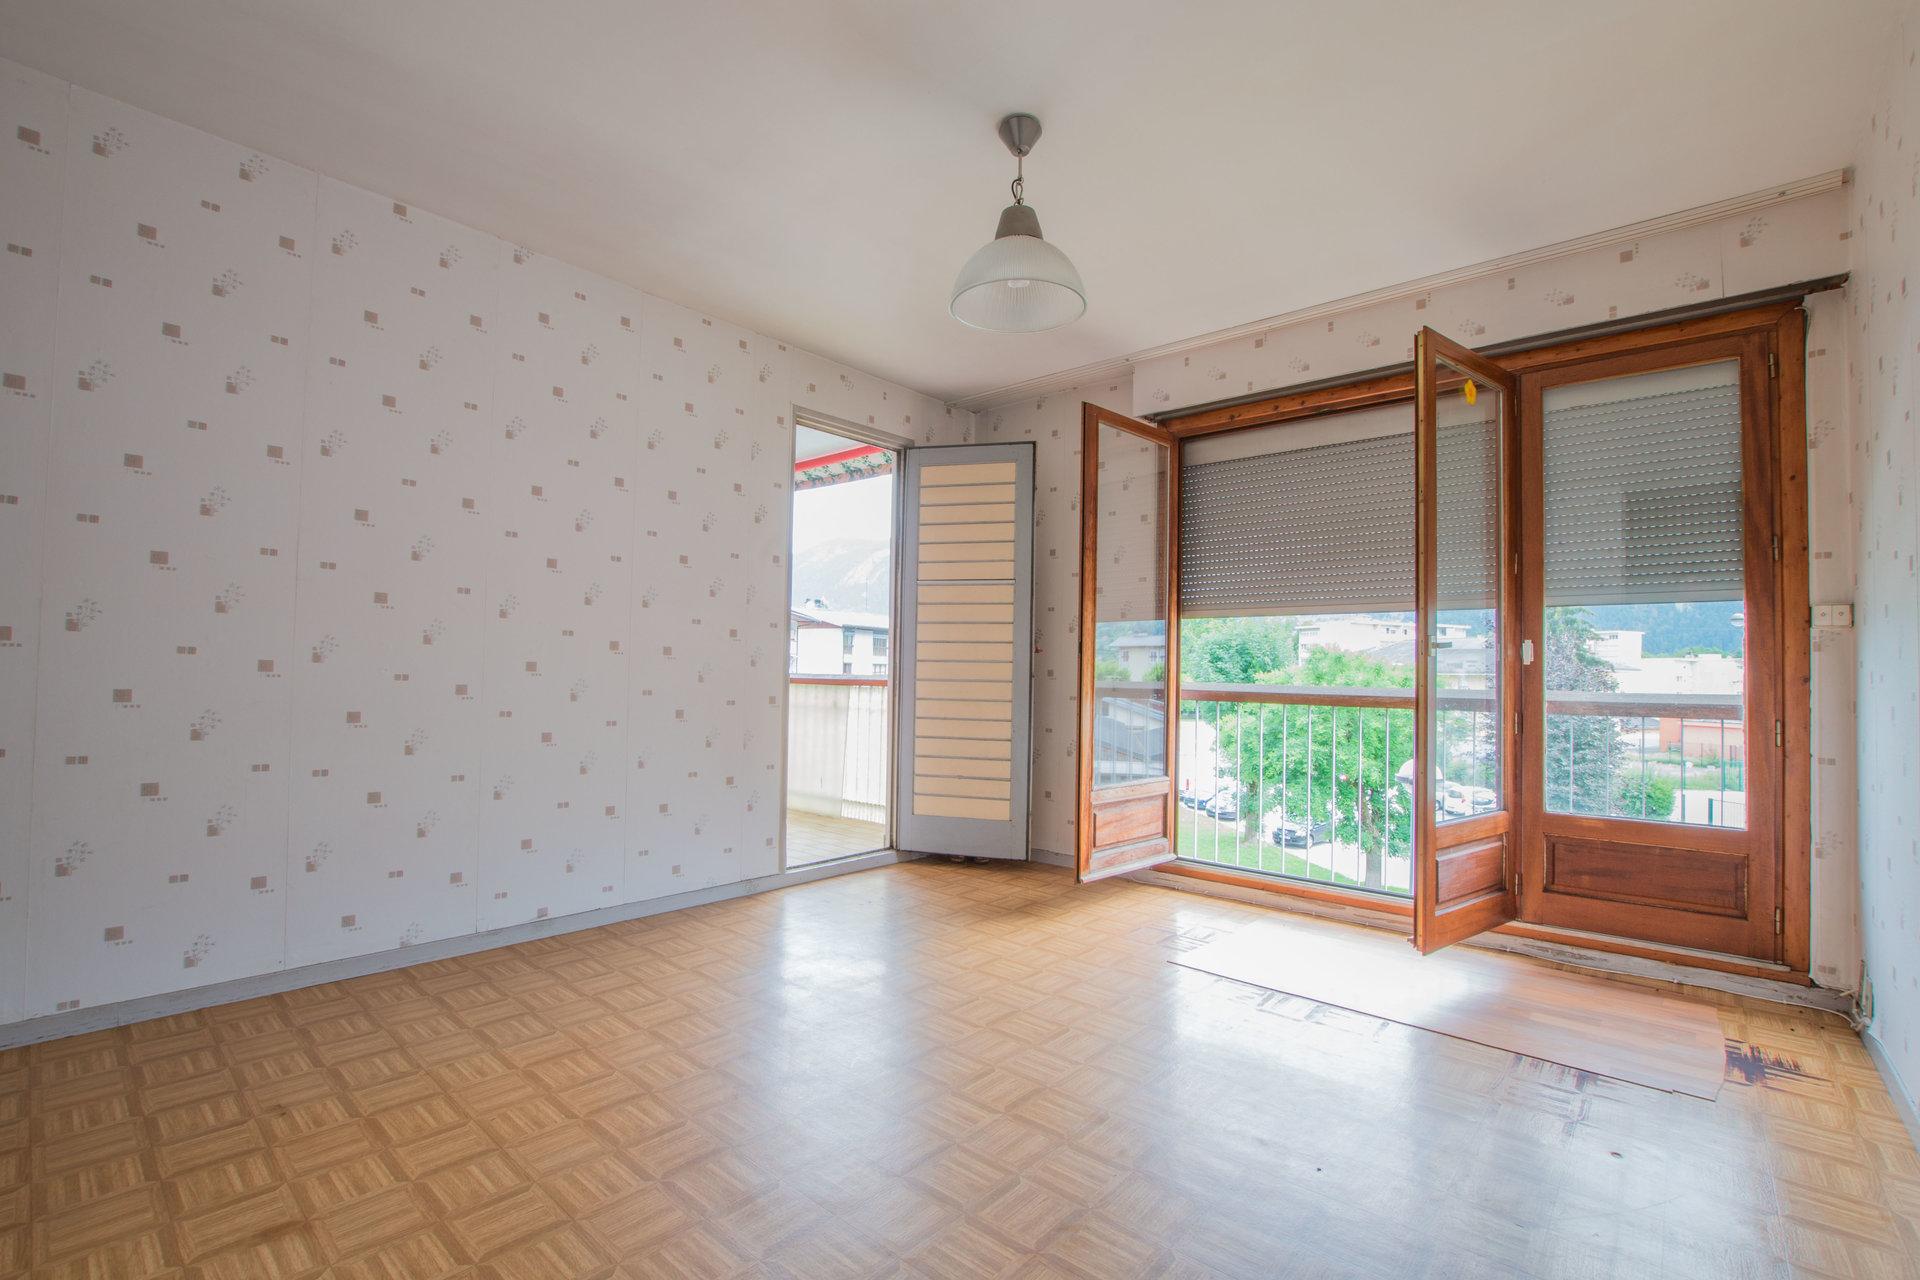 Sale Apartment - Scionzier